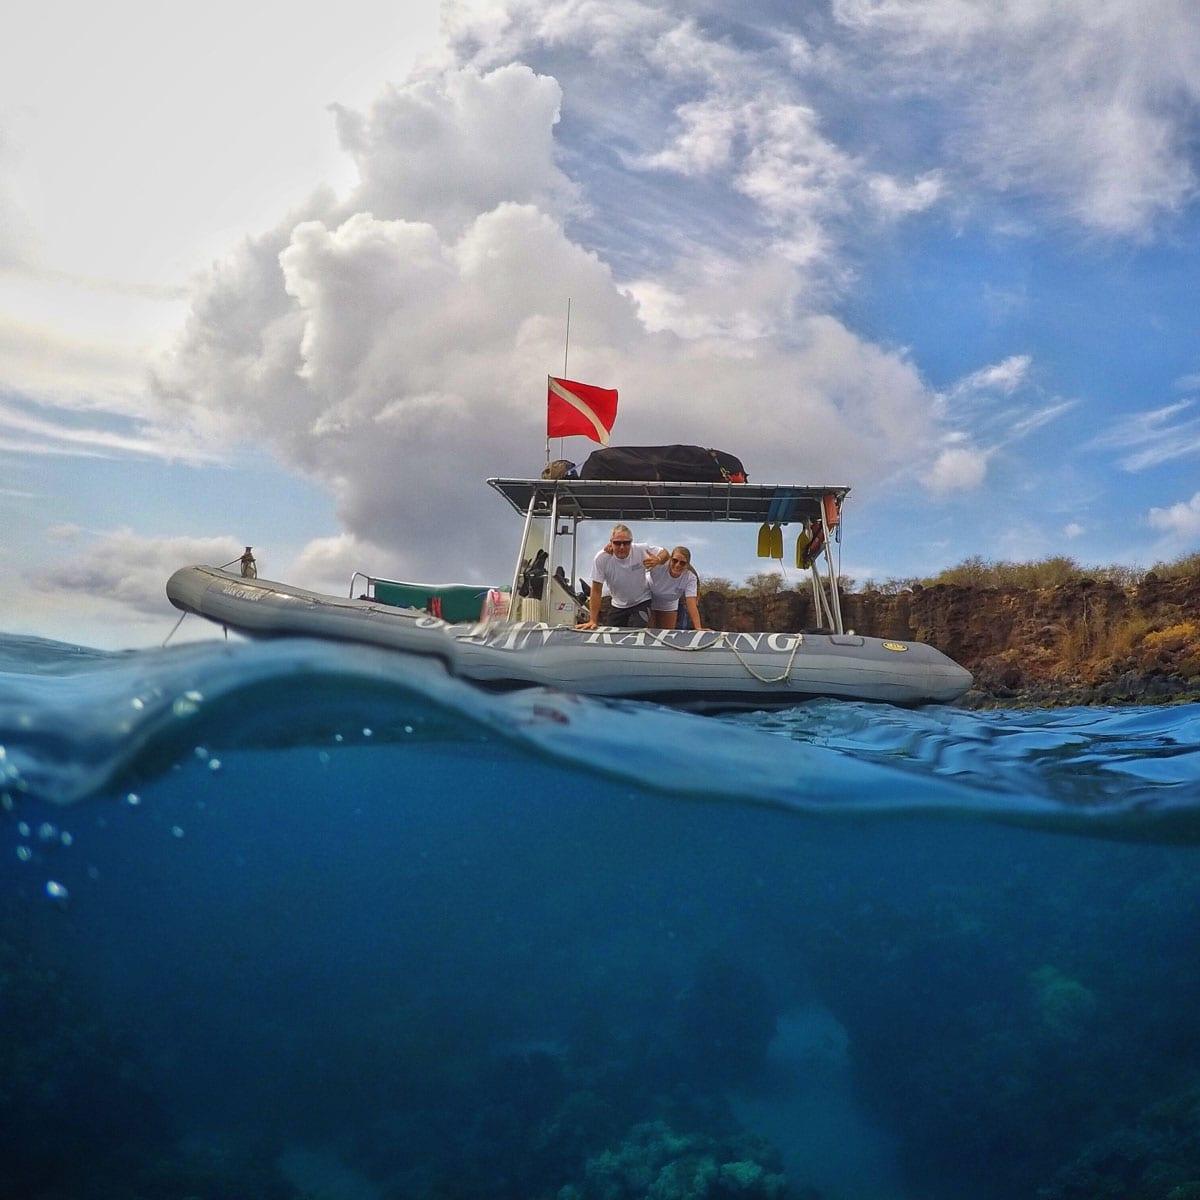 Hawaii Ocean Rafting – Lanai Dolphin Snorkel Tours